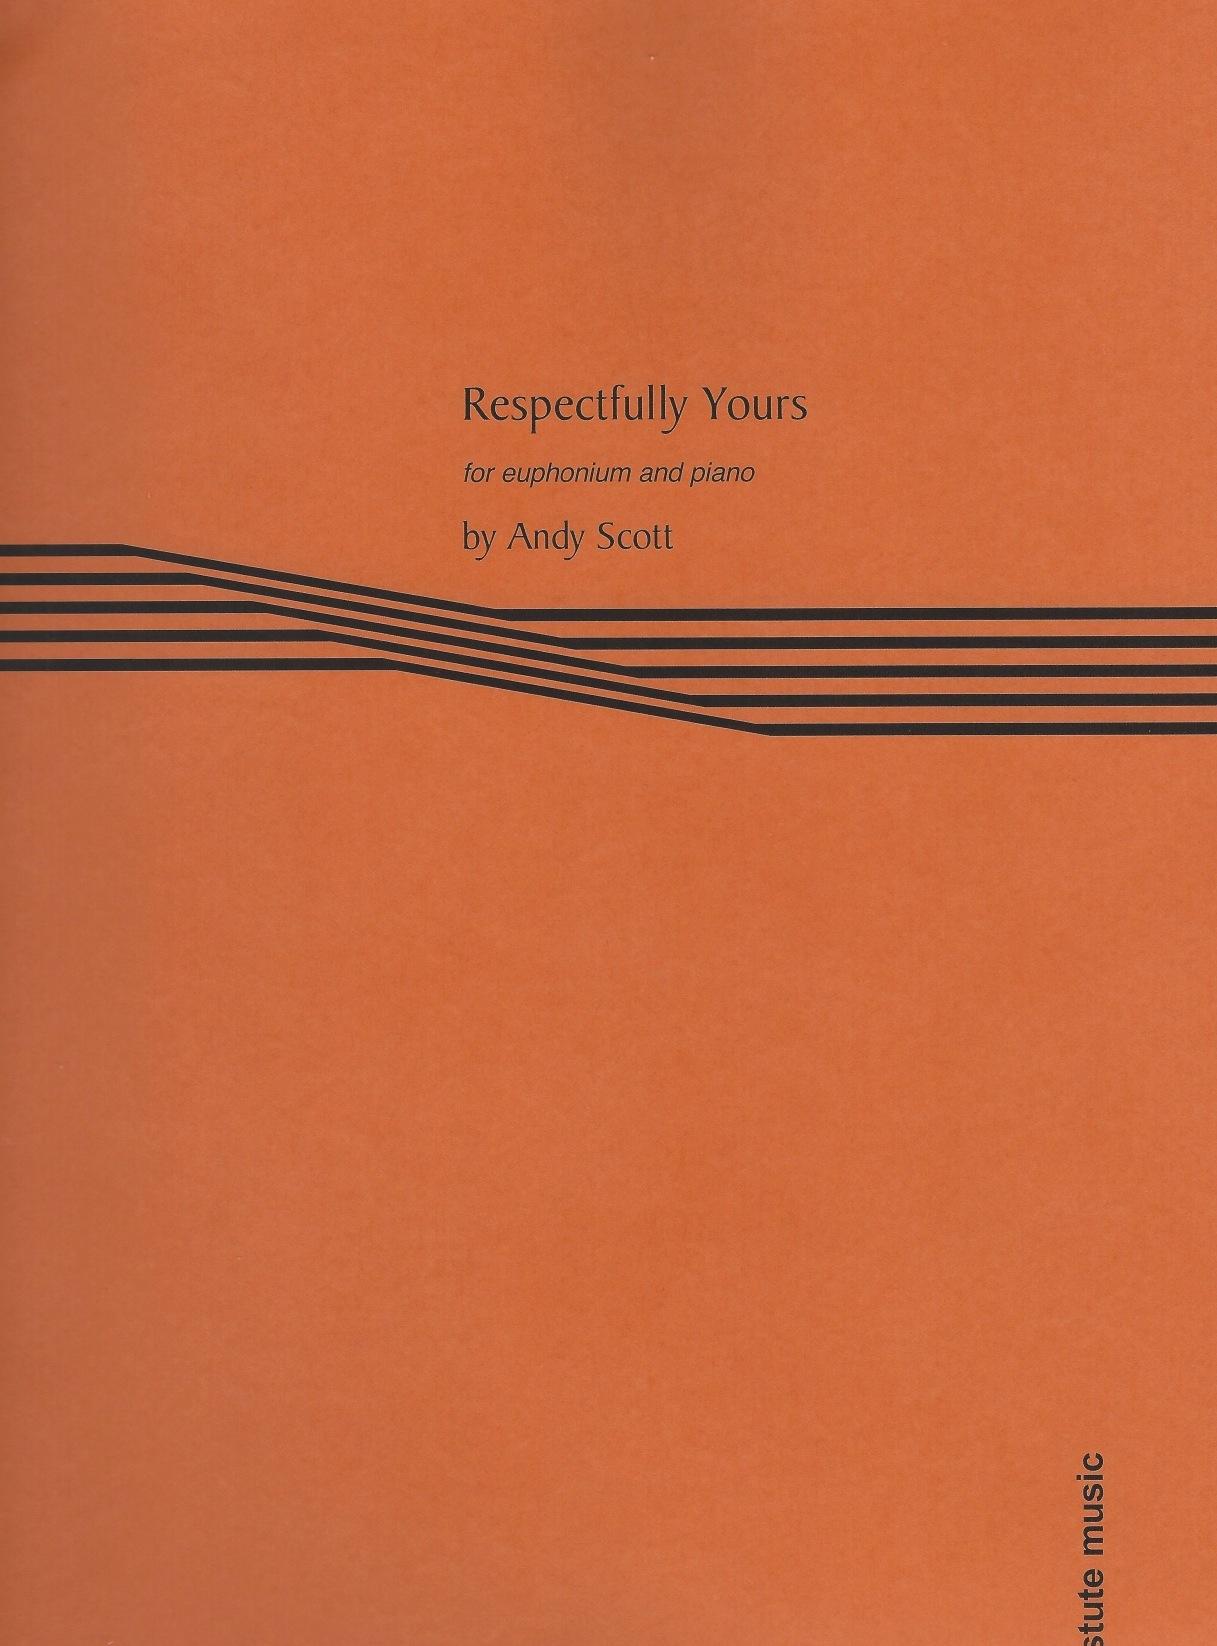 Respectfully Yours - Andy Scott  Euphonium and Piano